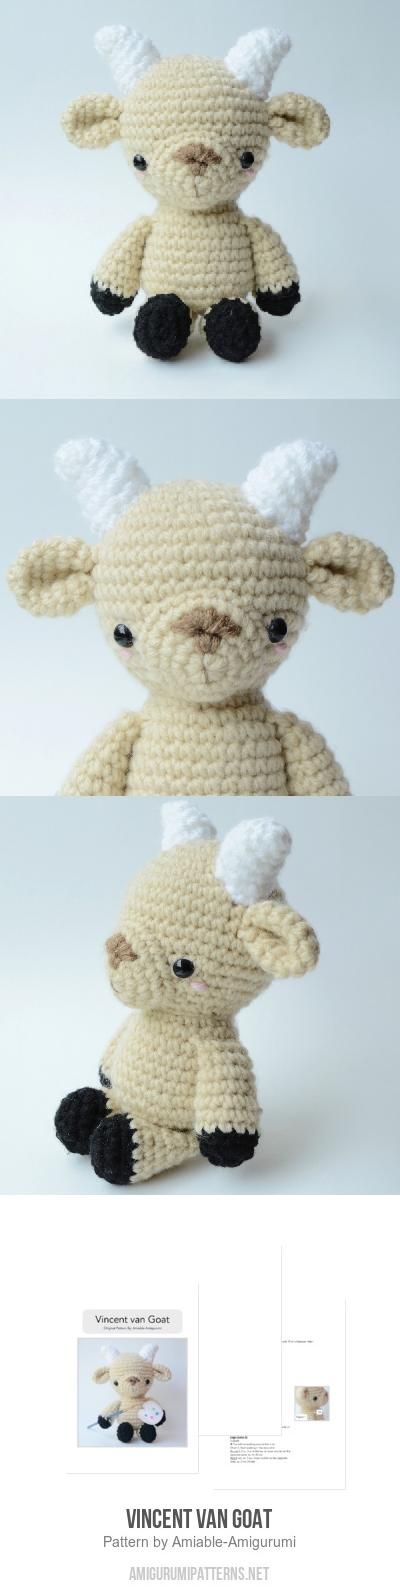 Vincent van Goat amigurumi pattern